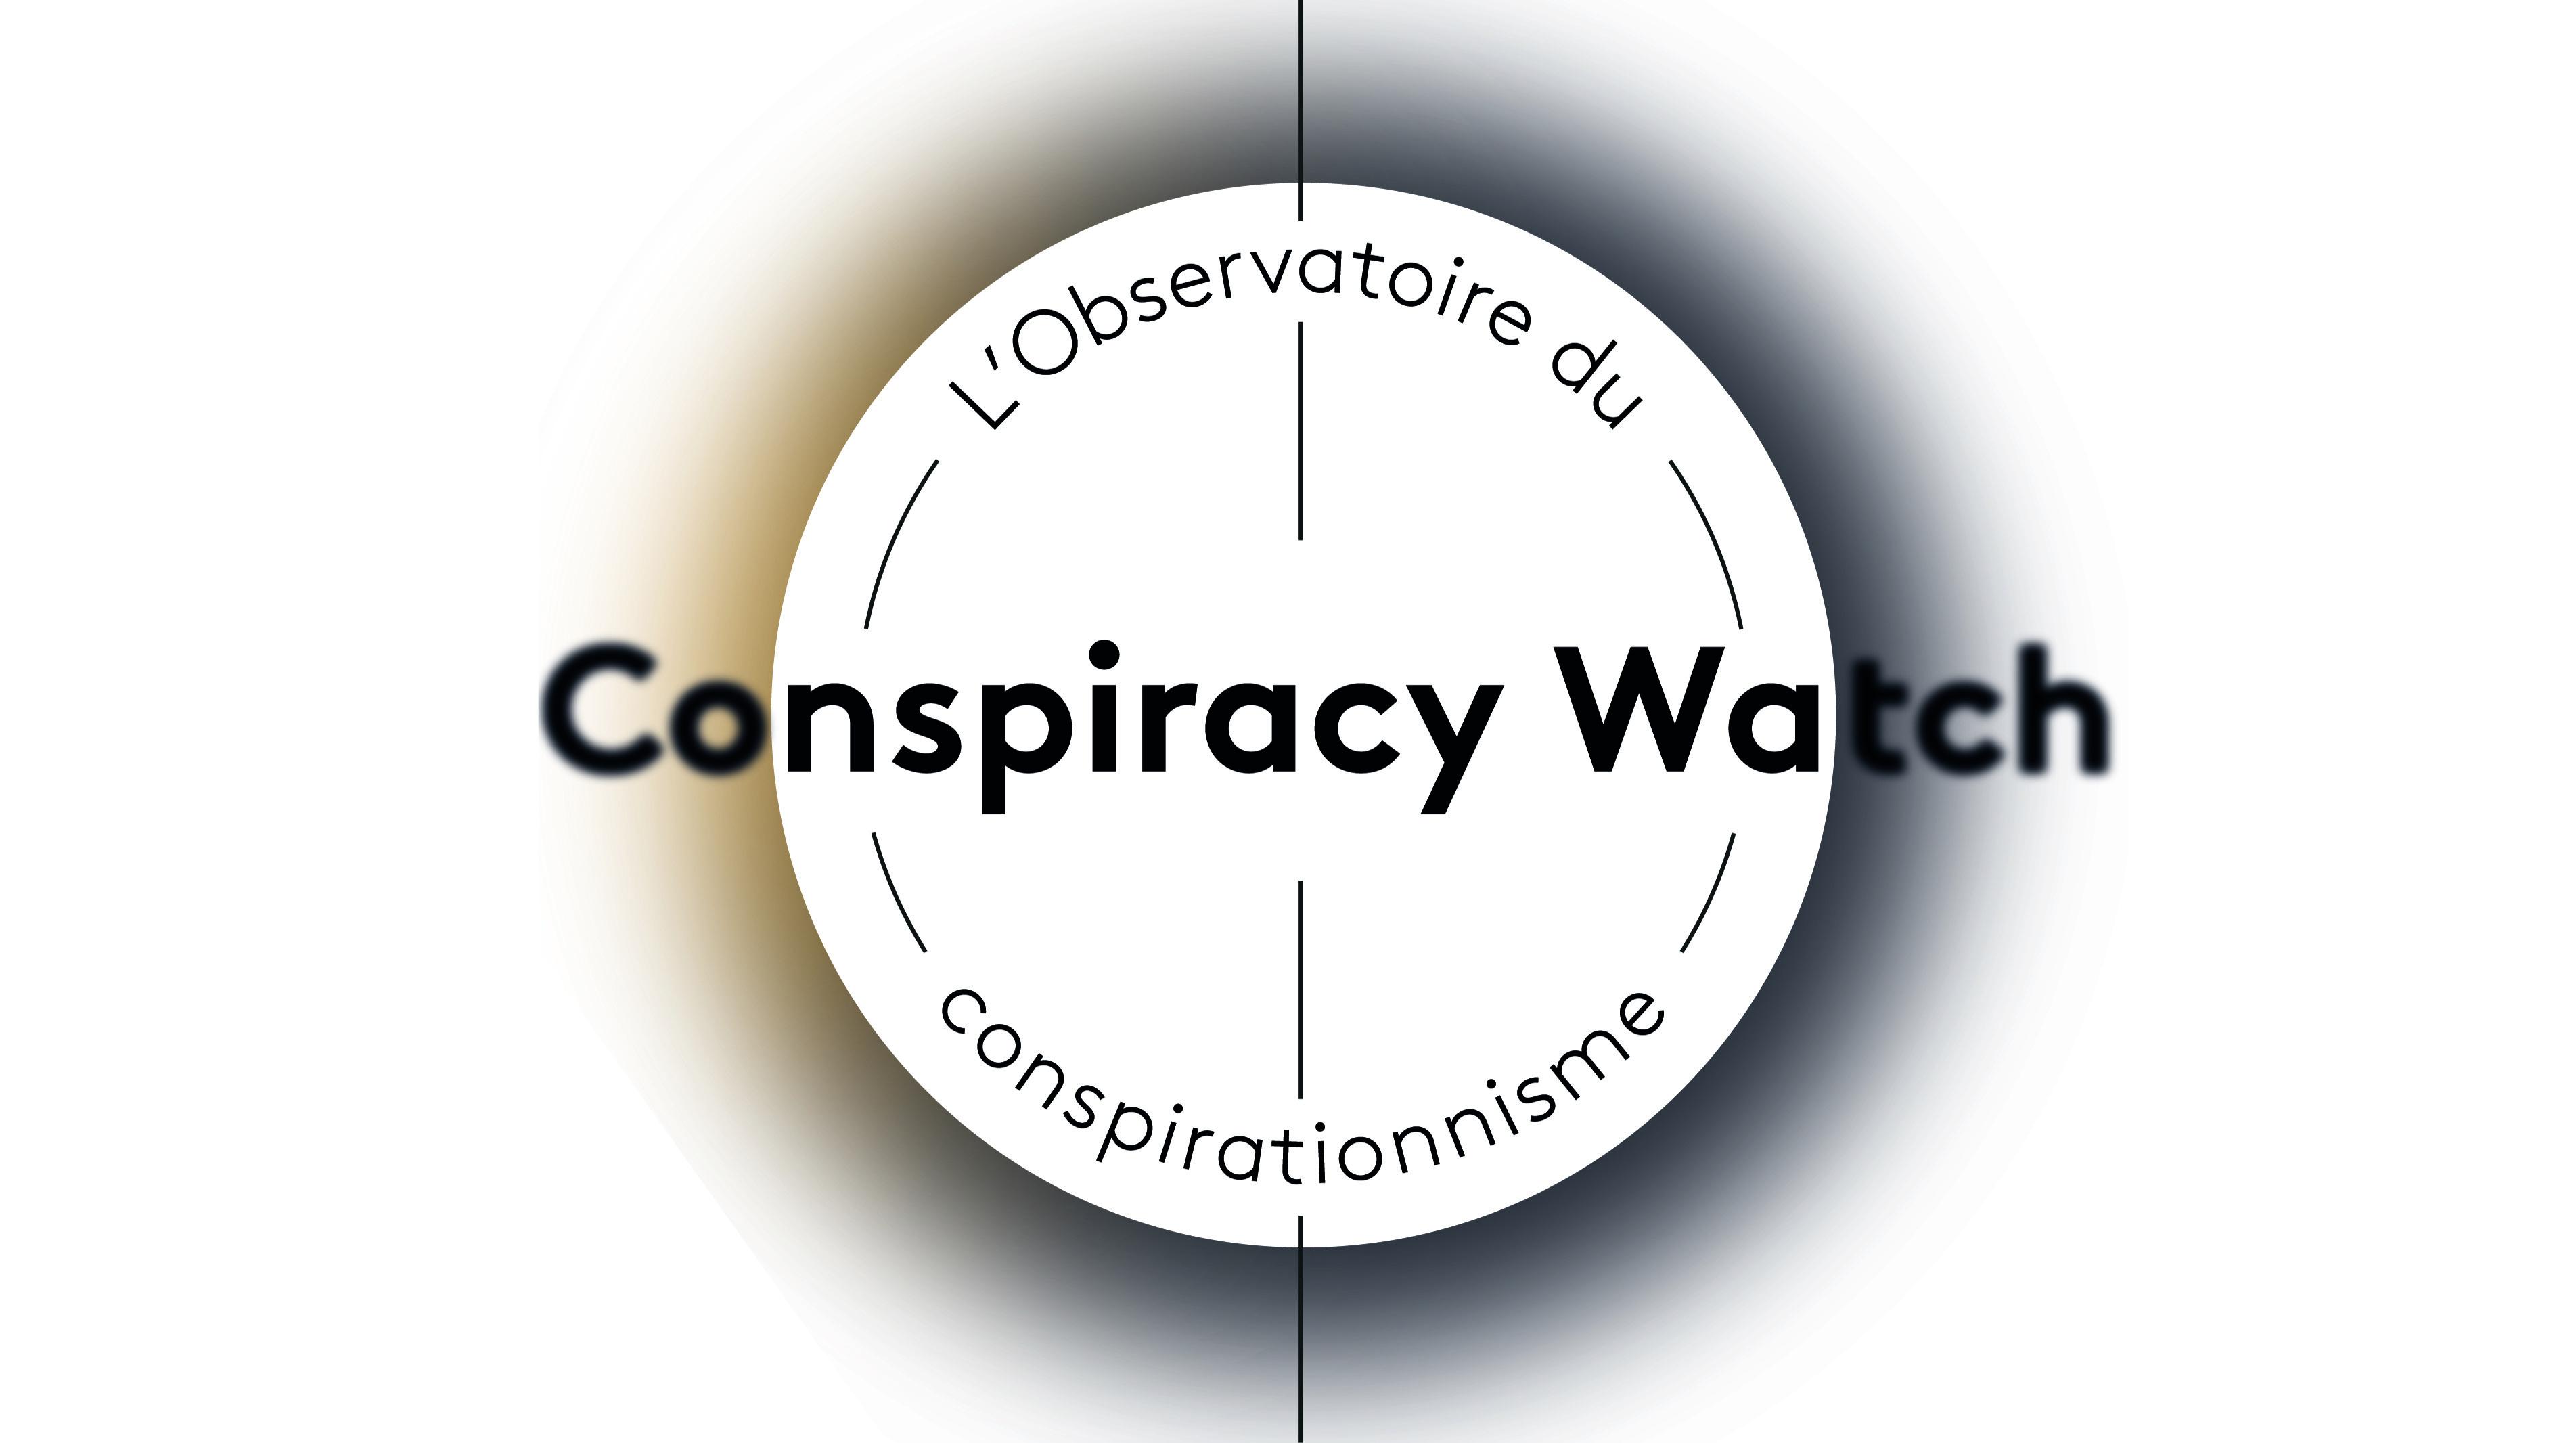 Conspiration, journalisme, trump, conspiracy watch